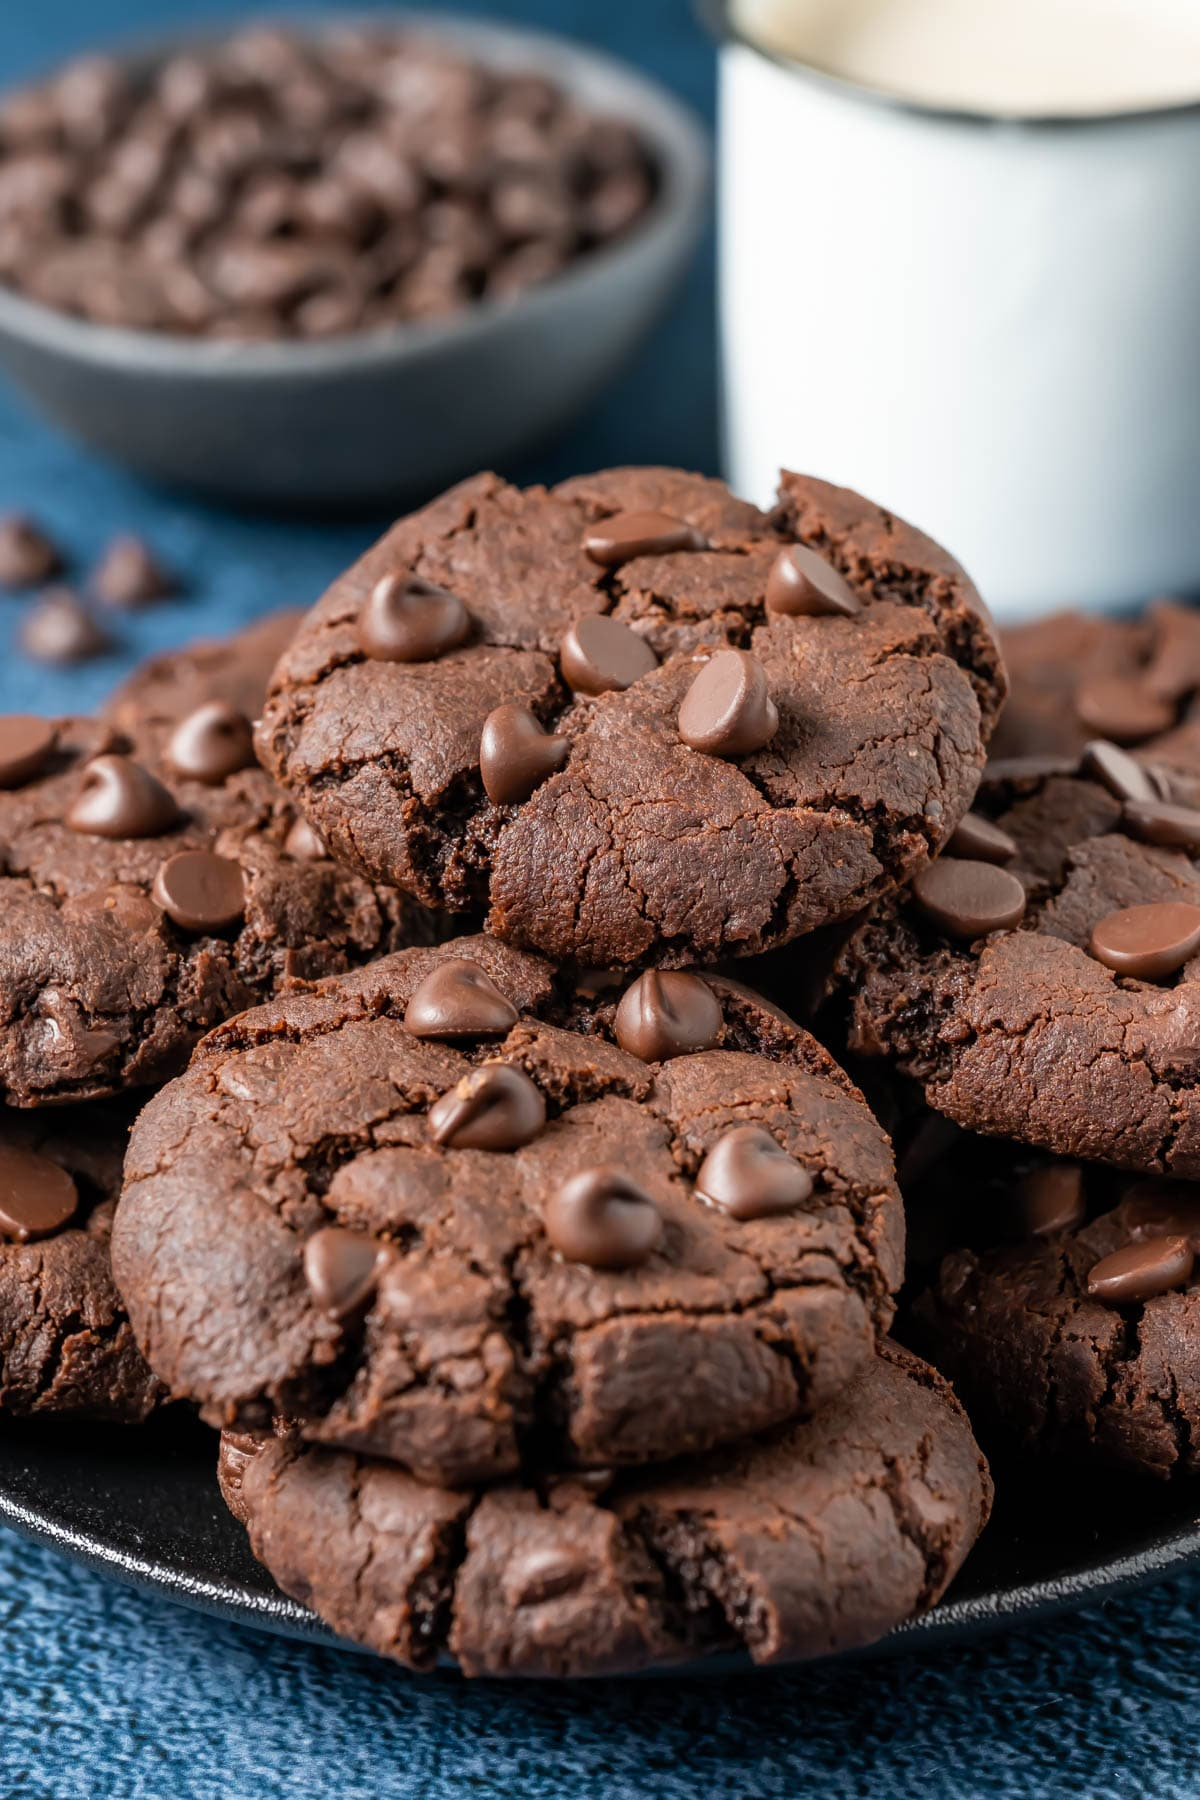 Vegan chocolate cookies on a black plate.